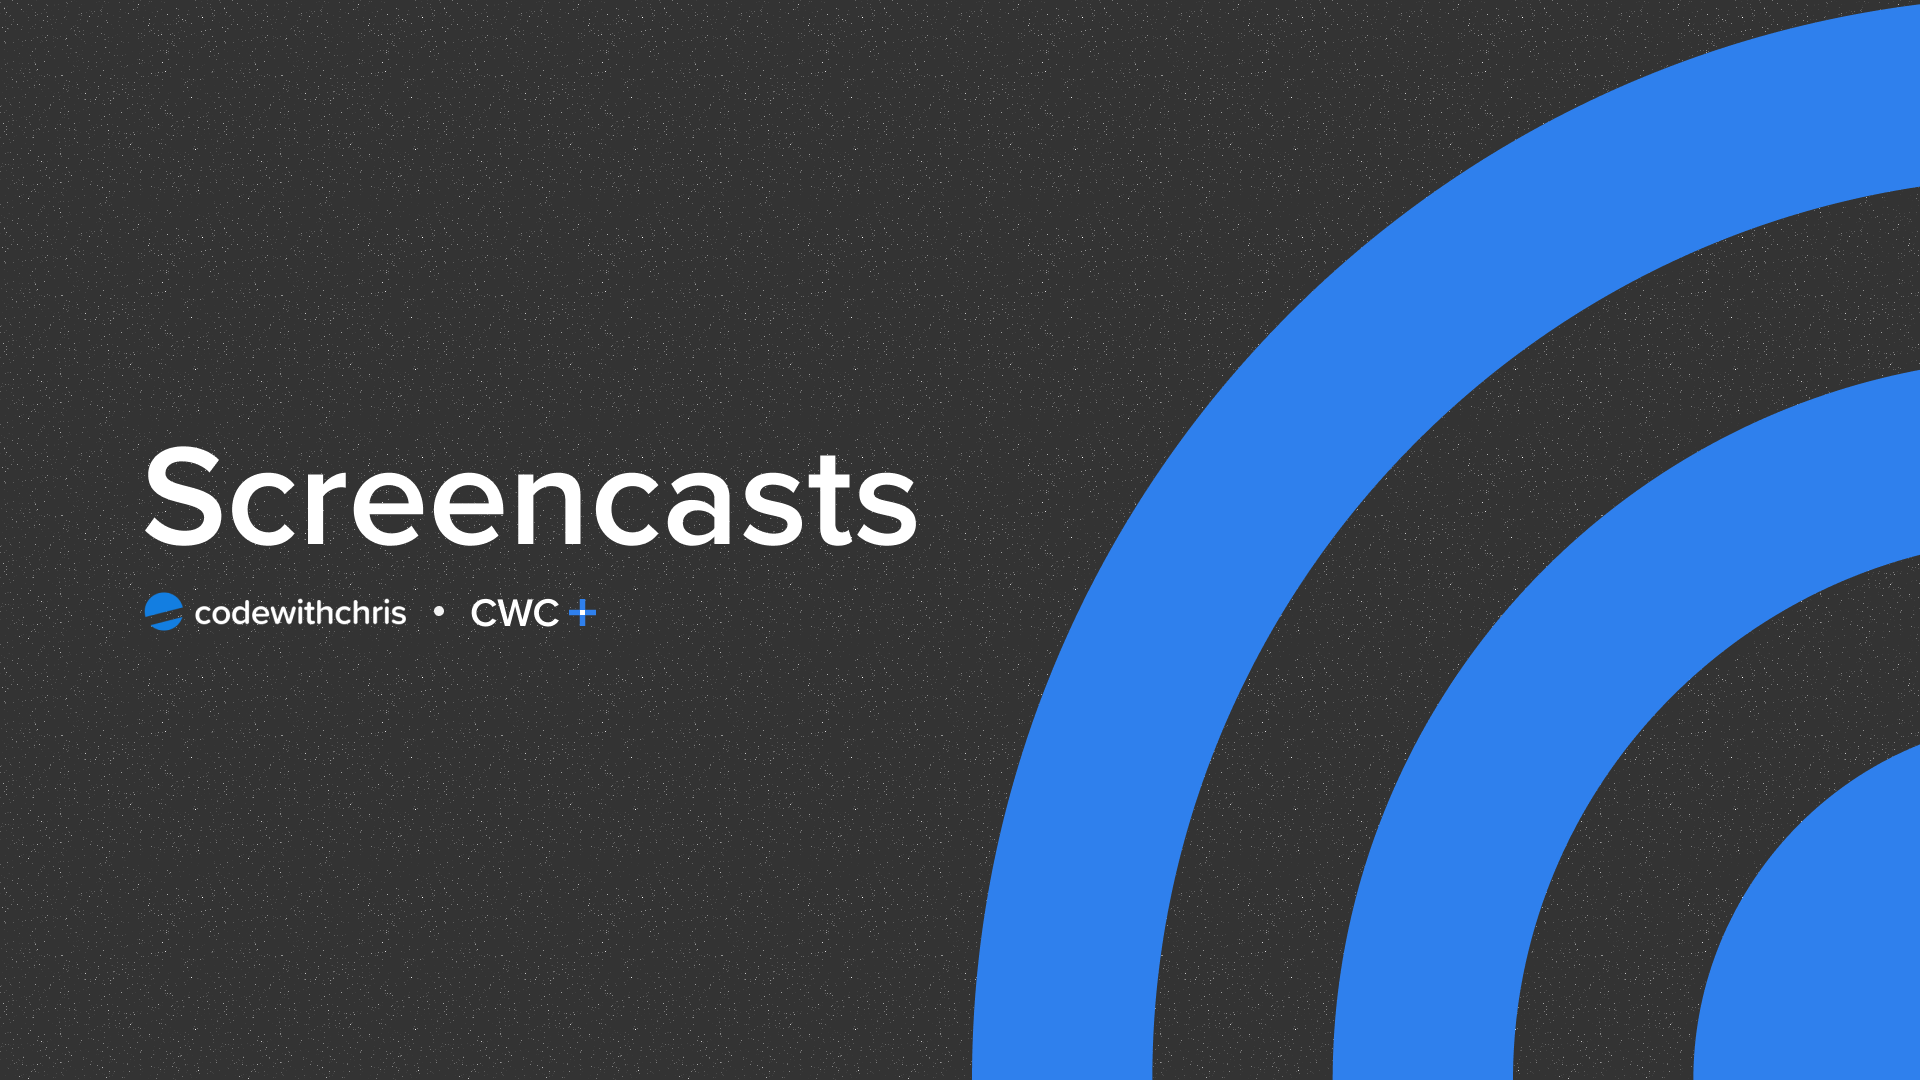 CWC+ Screencasts